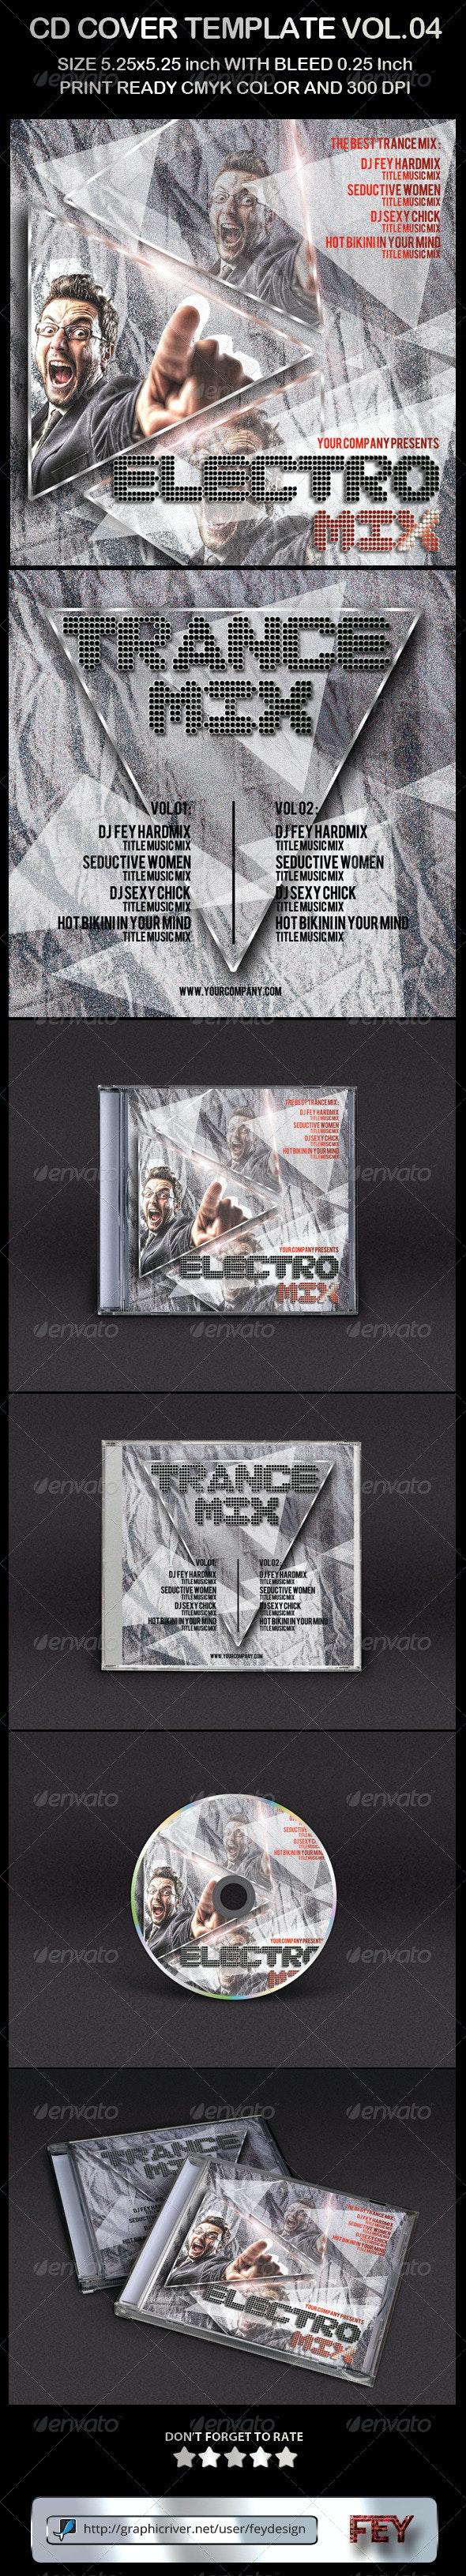 CD Cover Template Vol.04 - CD & DVD Artwork Print Templates